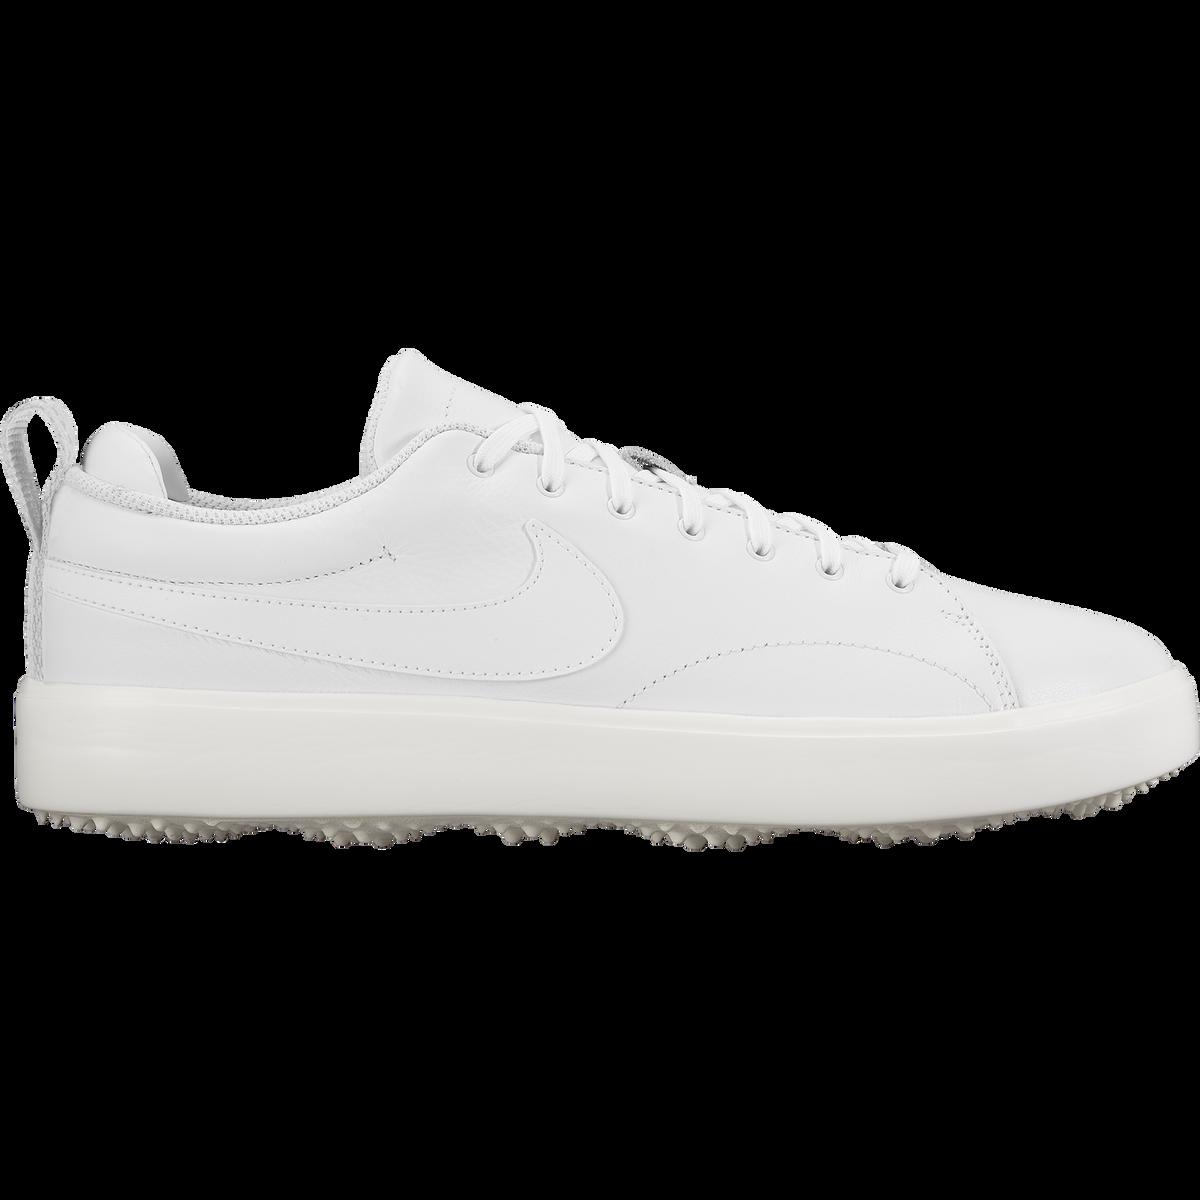 8cb6f222e988 Nike Course Classic Women s Golf Shoe - White